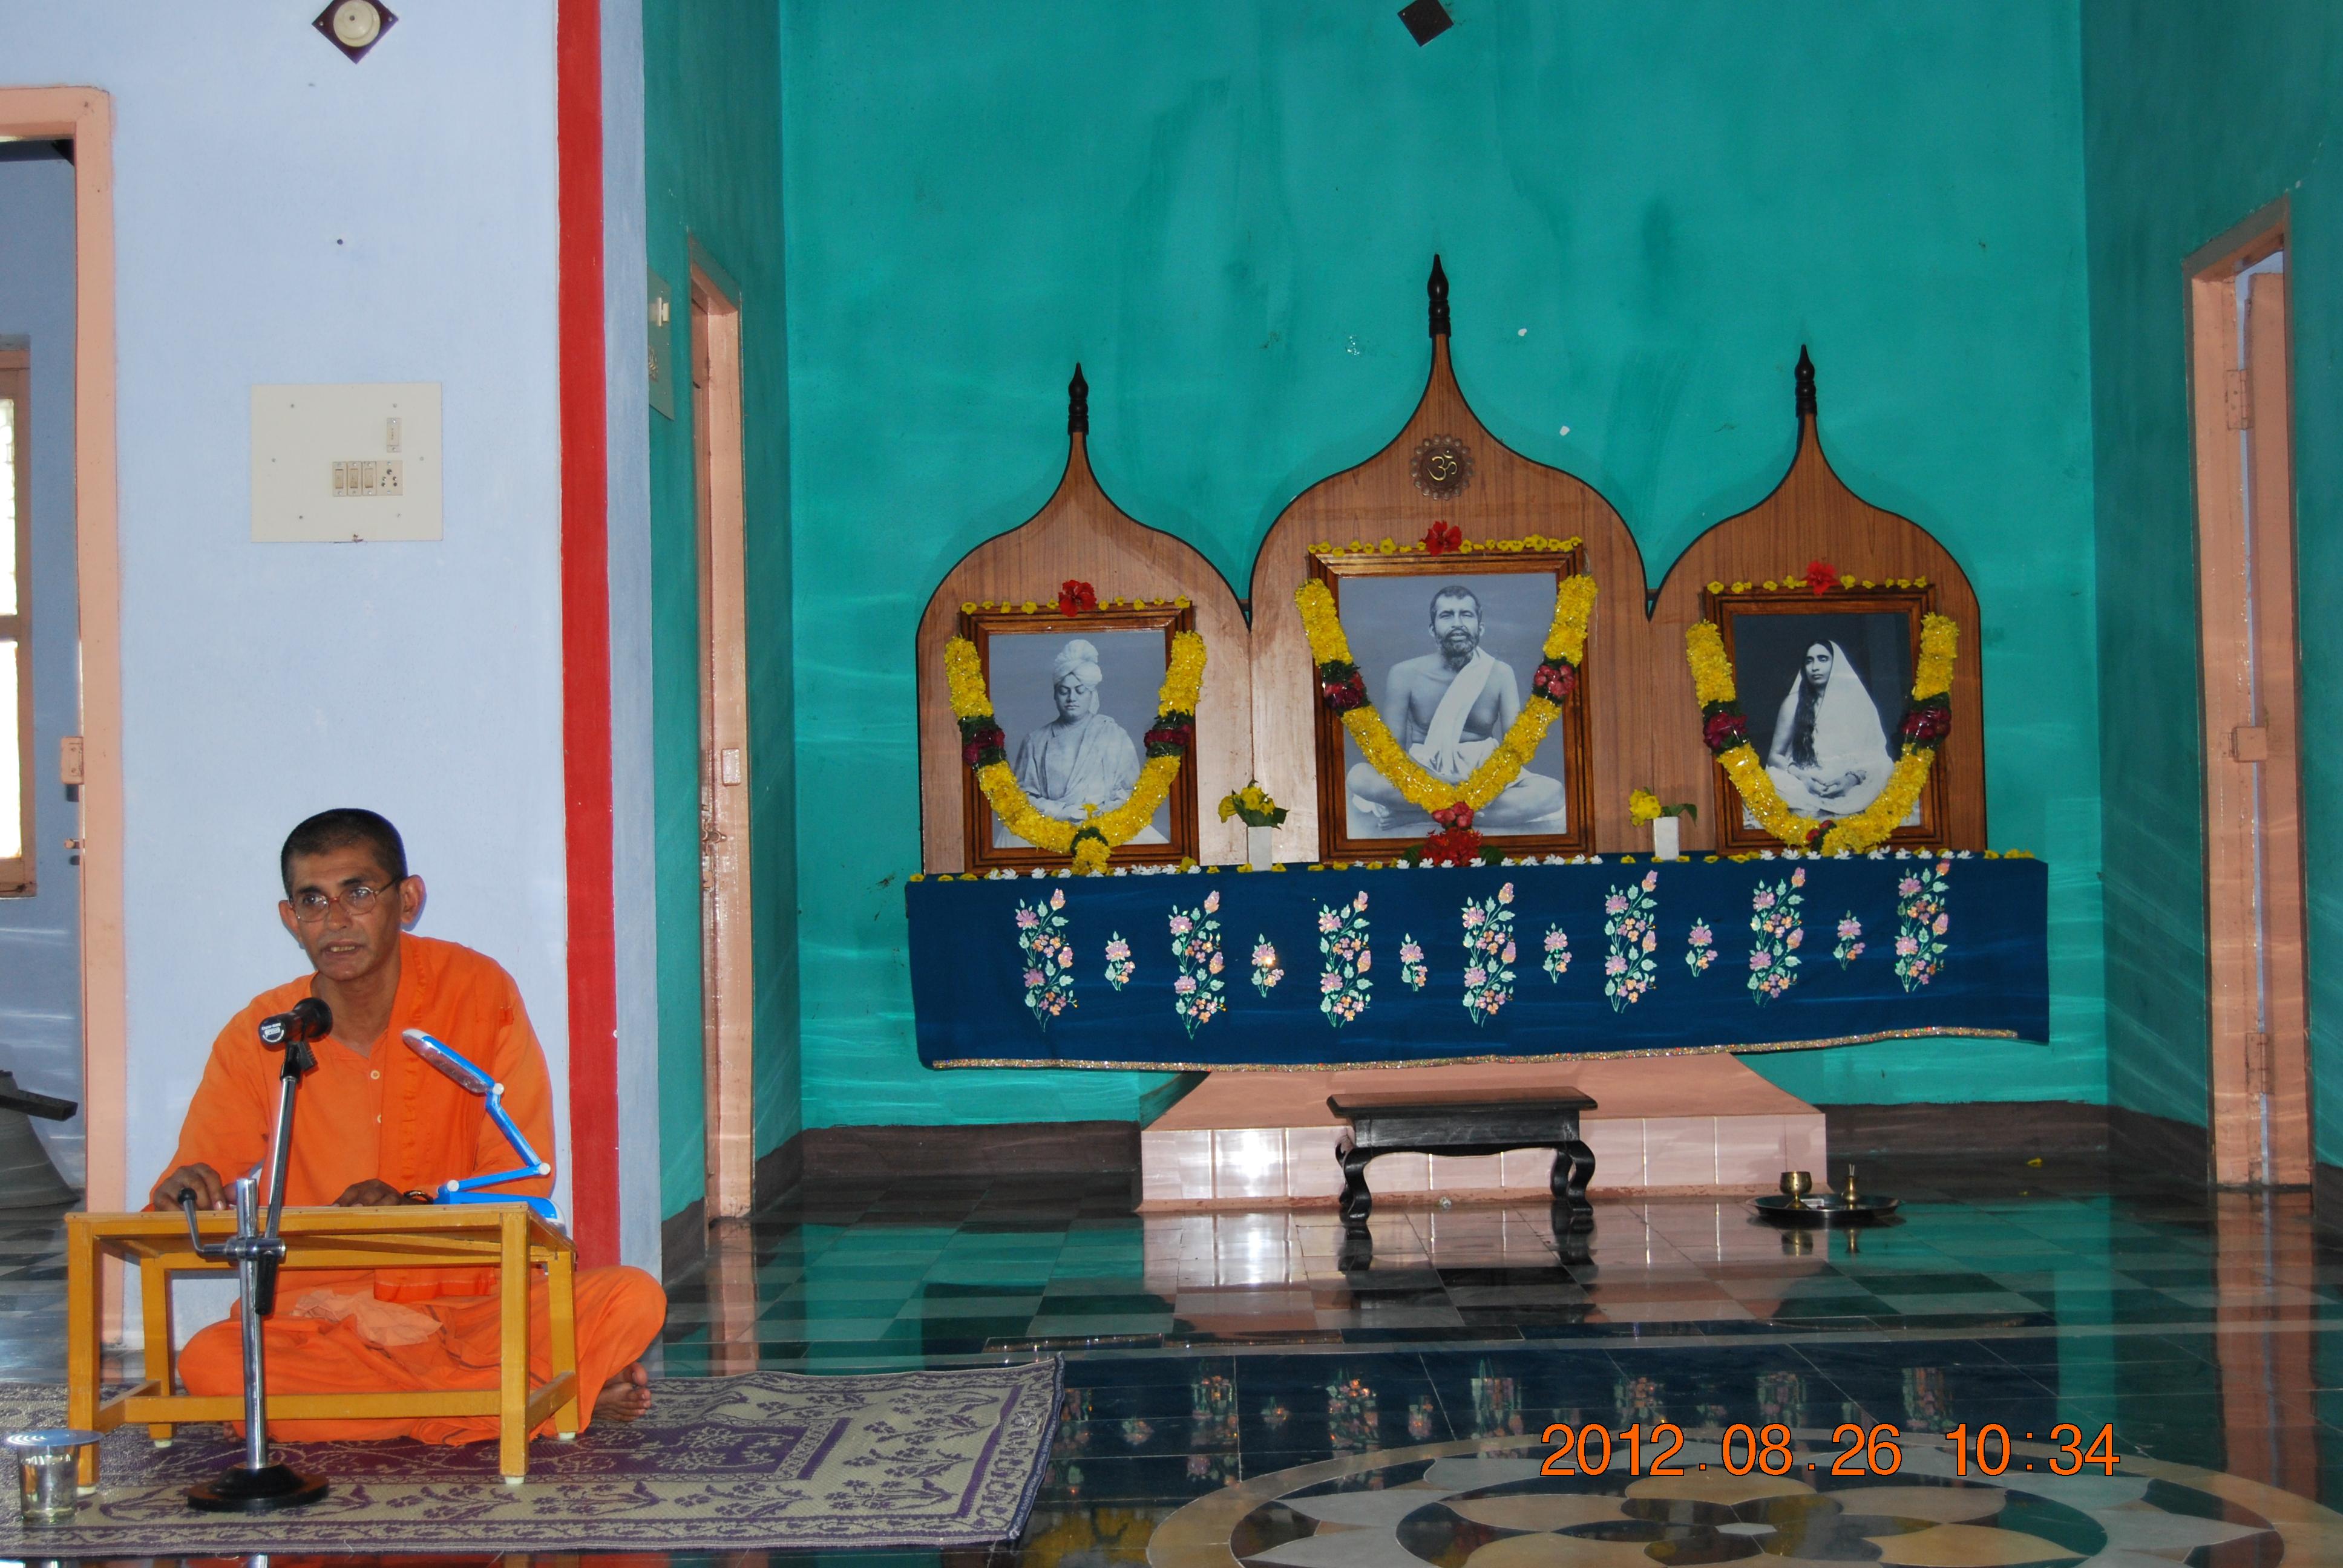 Revered Swami Punyatmanandaji Maharaj addressing the devotees 26 Aug 2012